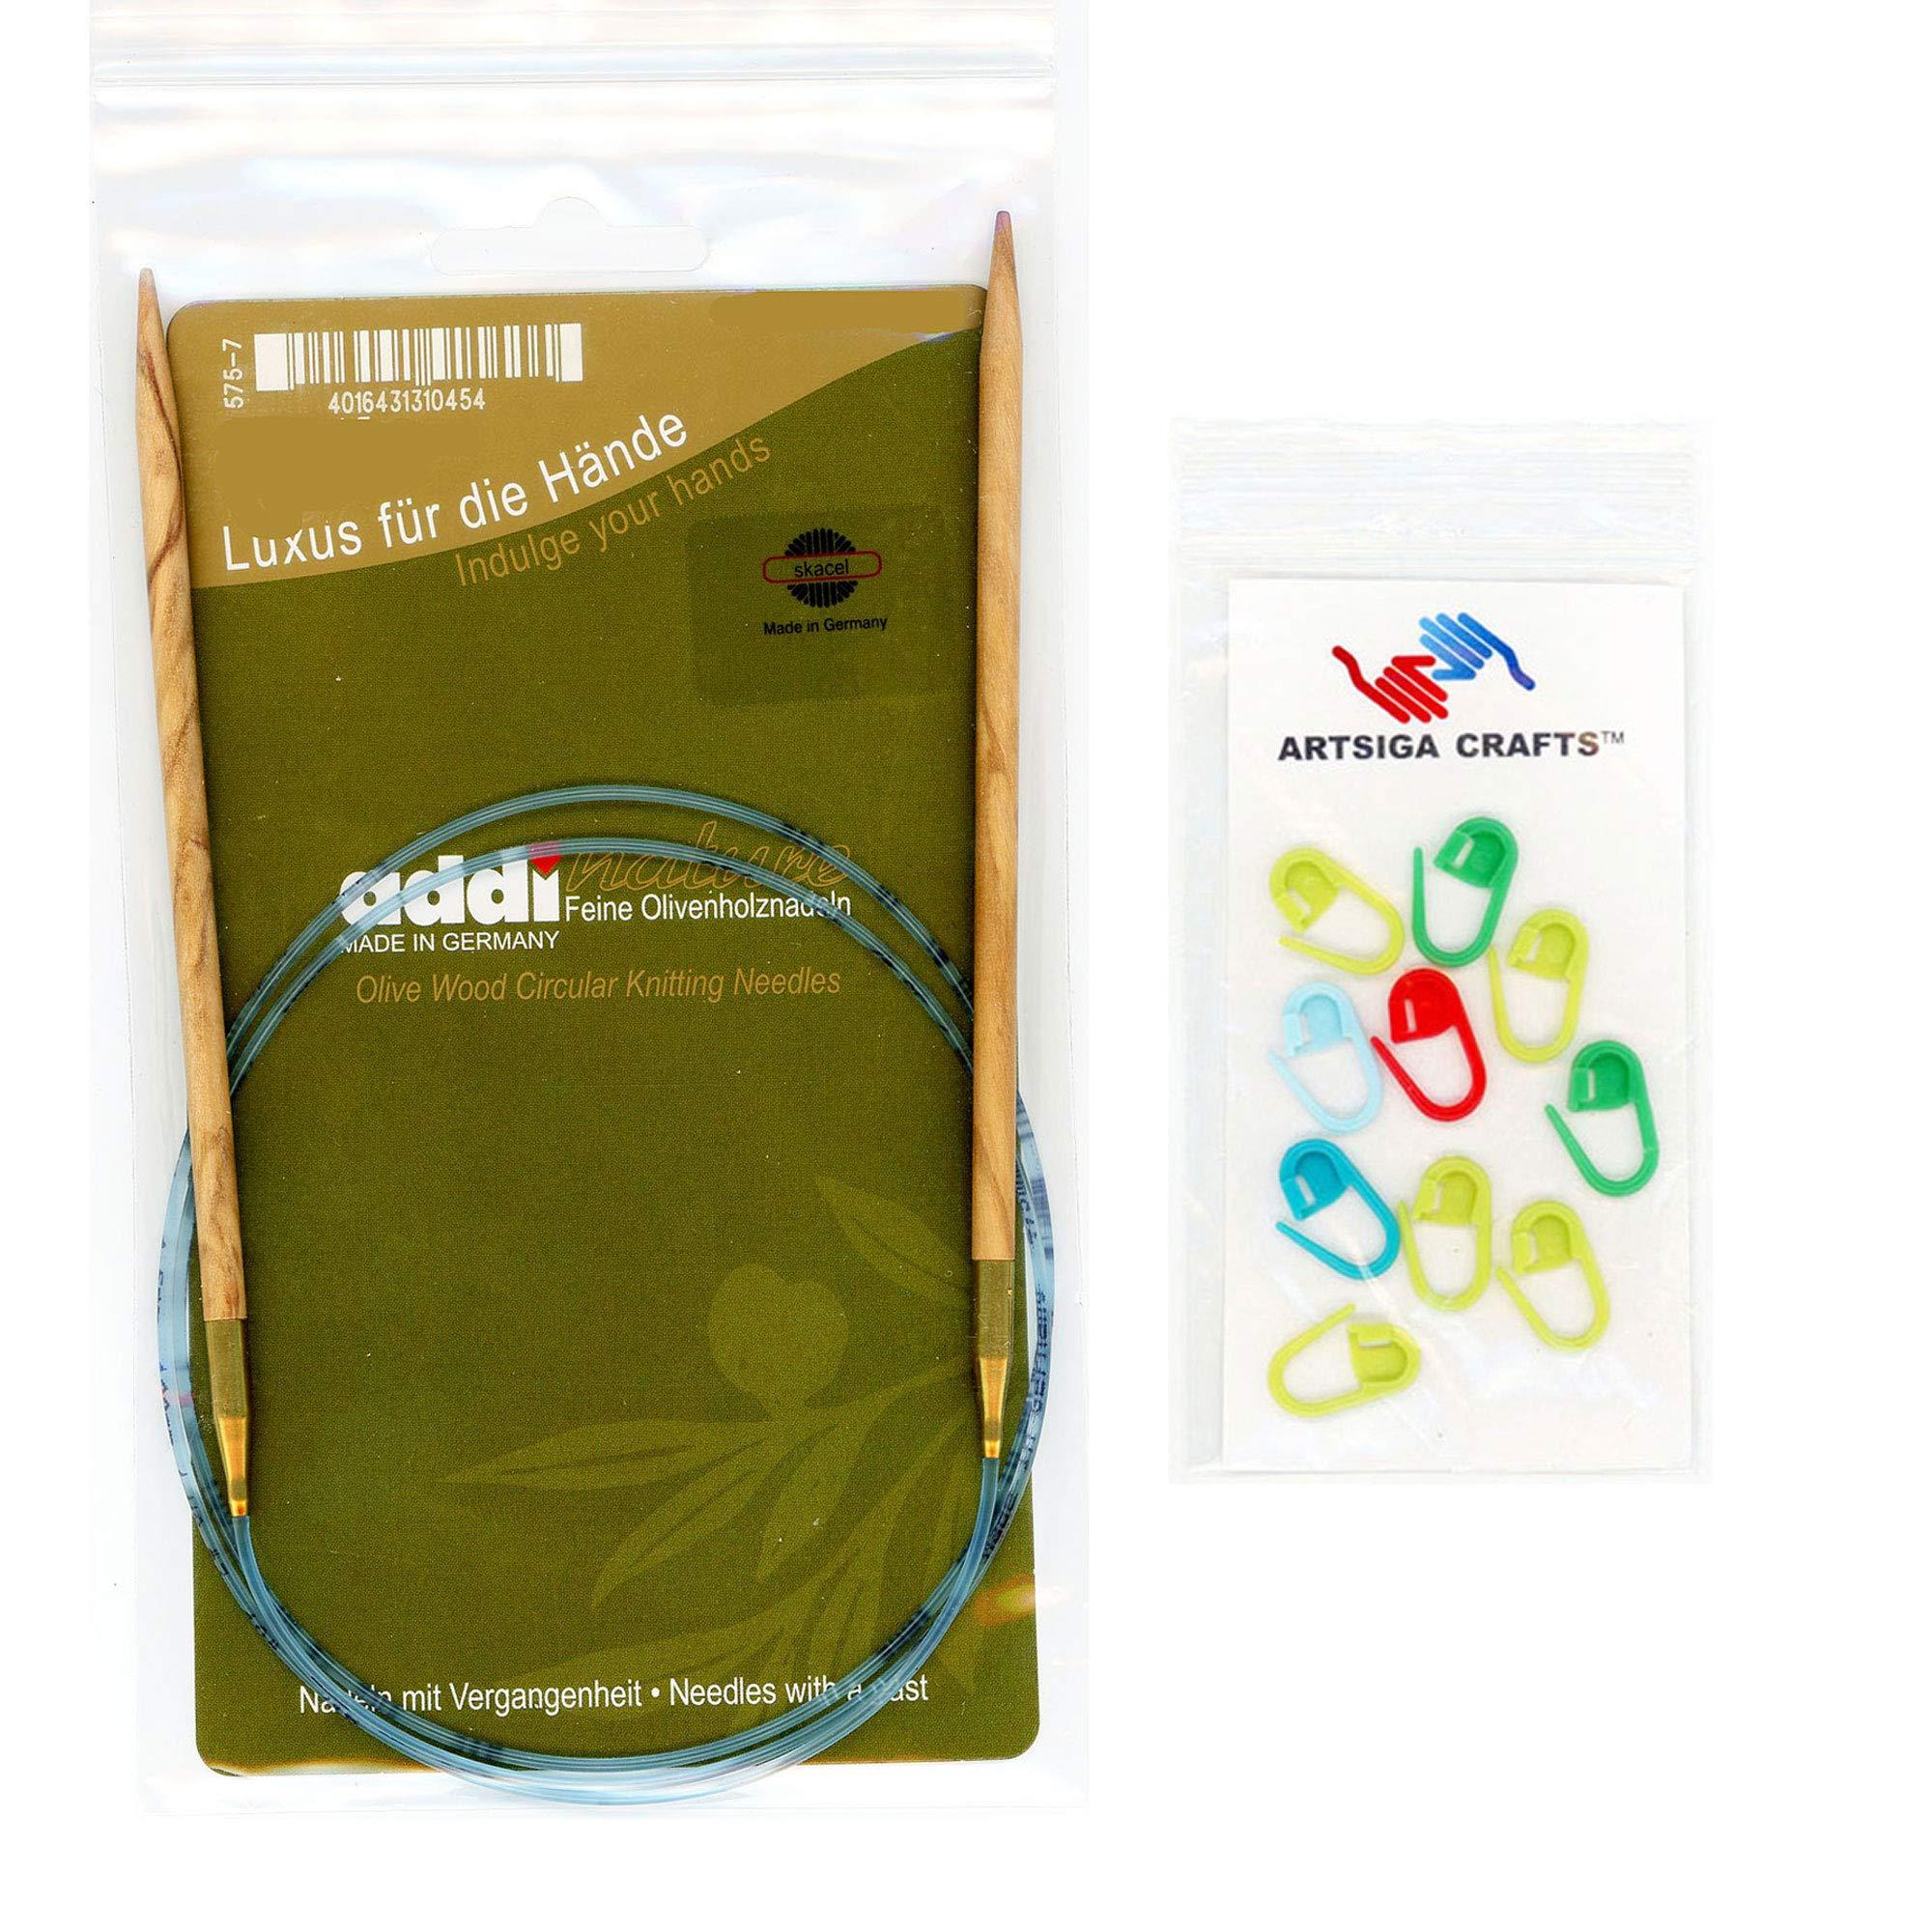 addi Knitting Needle Circular Olive Wood Skacel Exclusive Blue Cord 60 inch (150cm) Size US 09 (5.5mm) Bundle with 10 Artsiga Crafts Stitch Markers